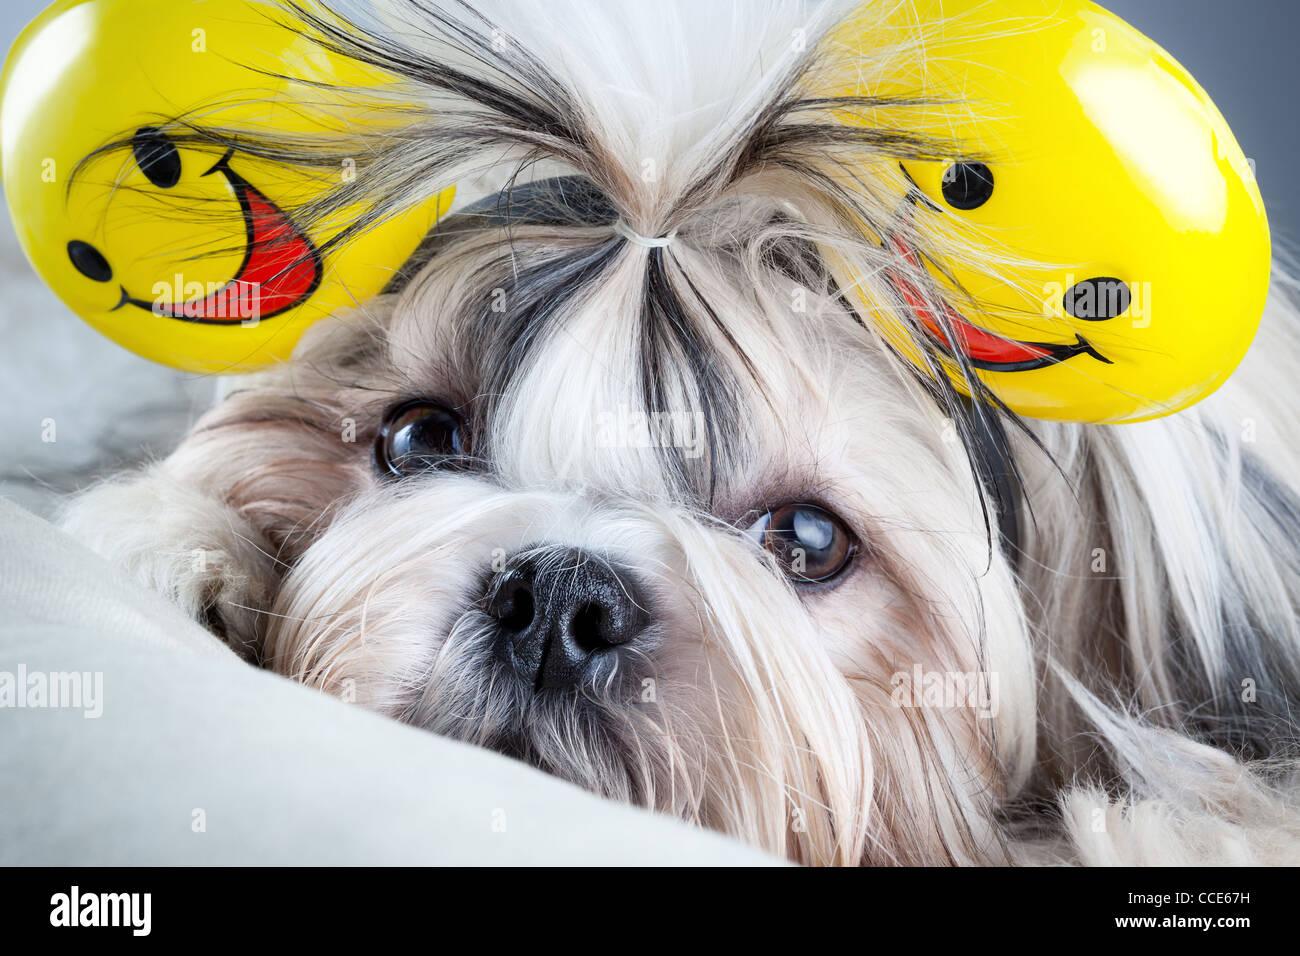 Shih tzu dog with smiles ears. - Stock Image